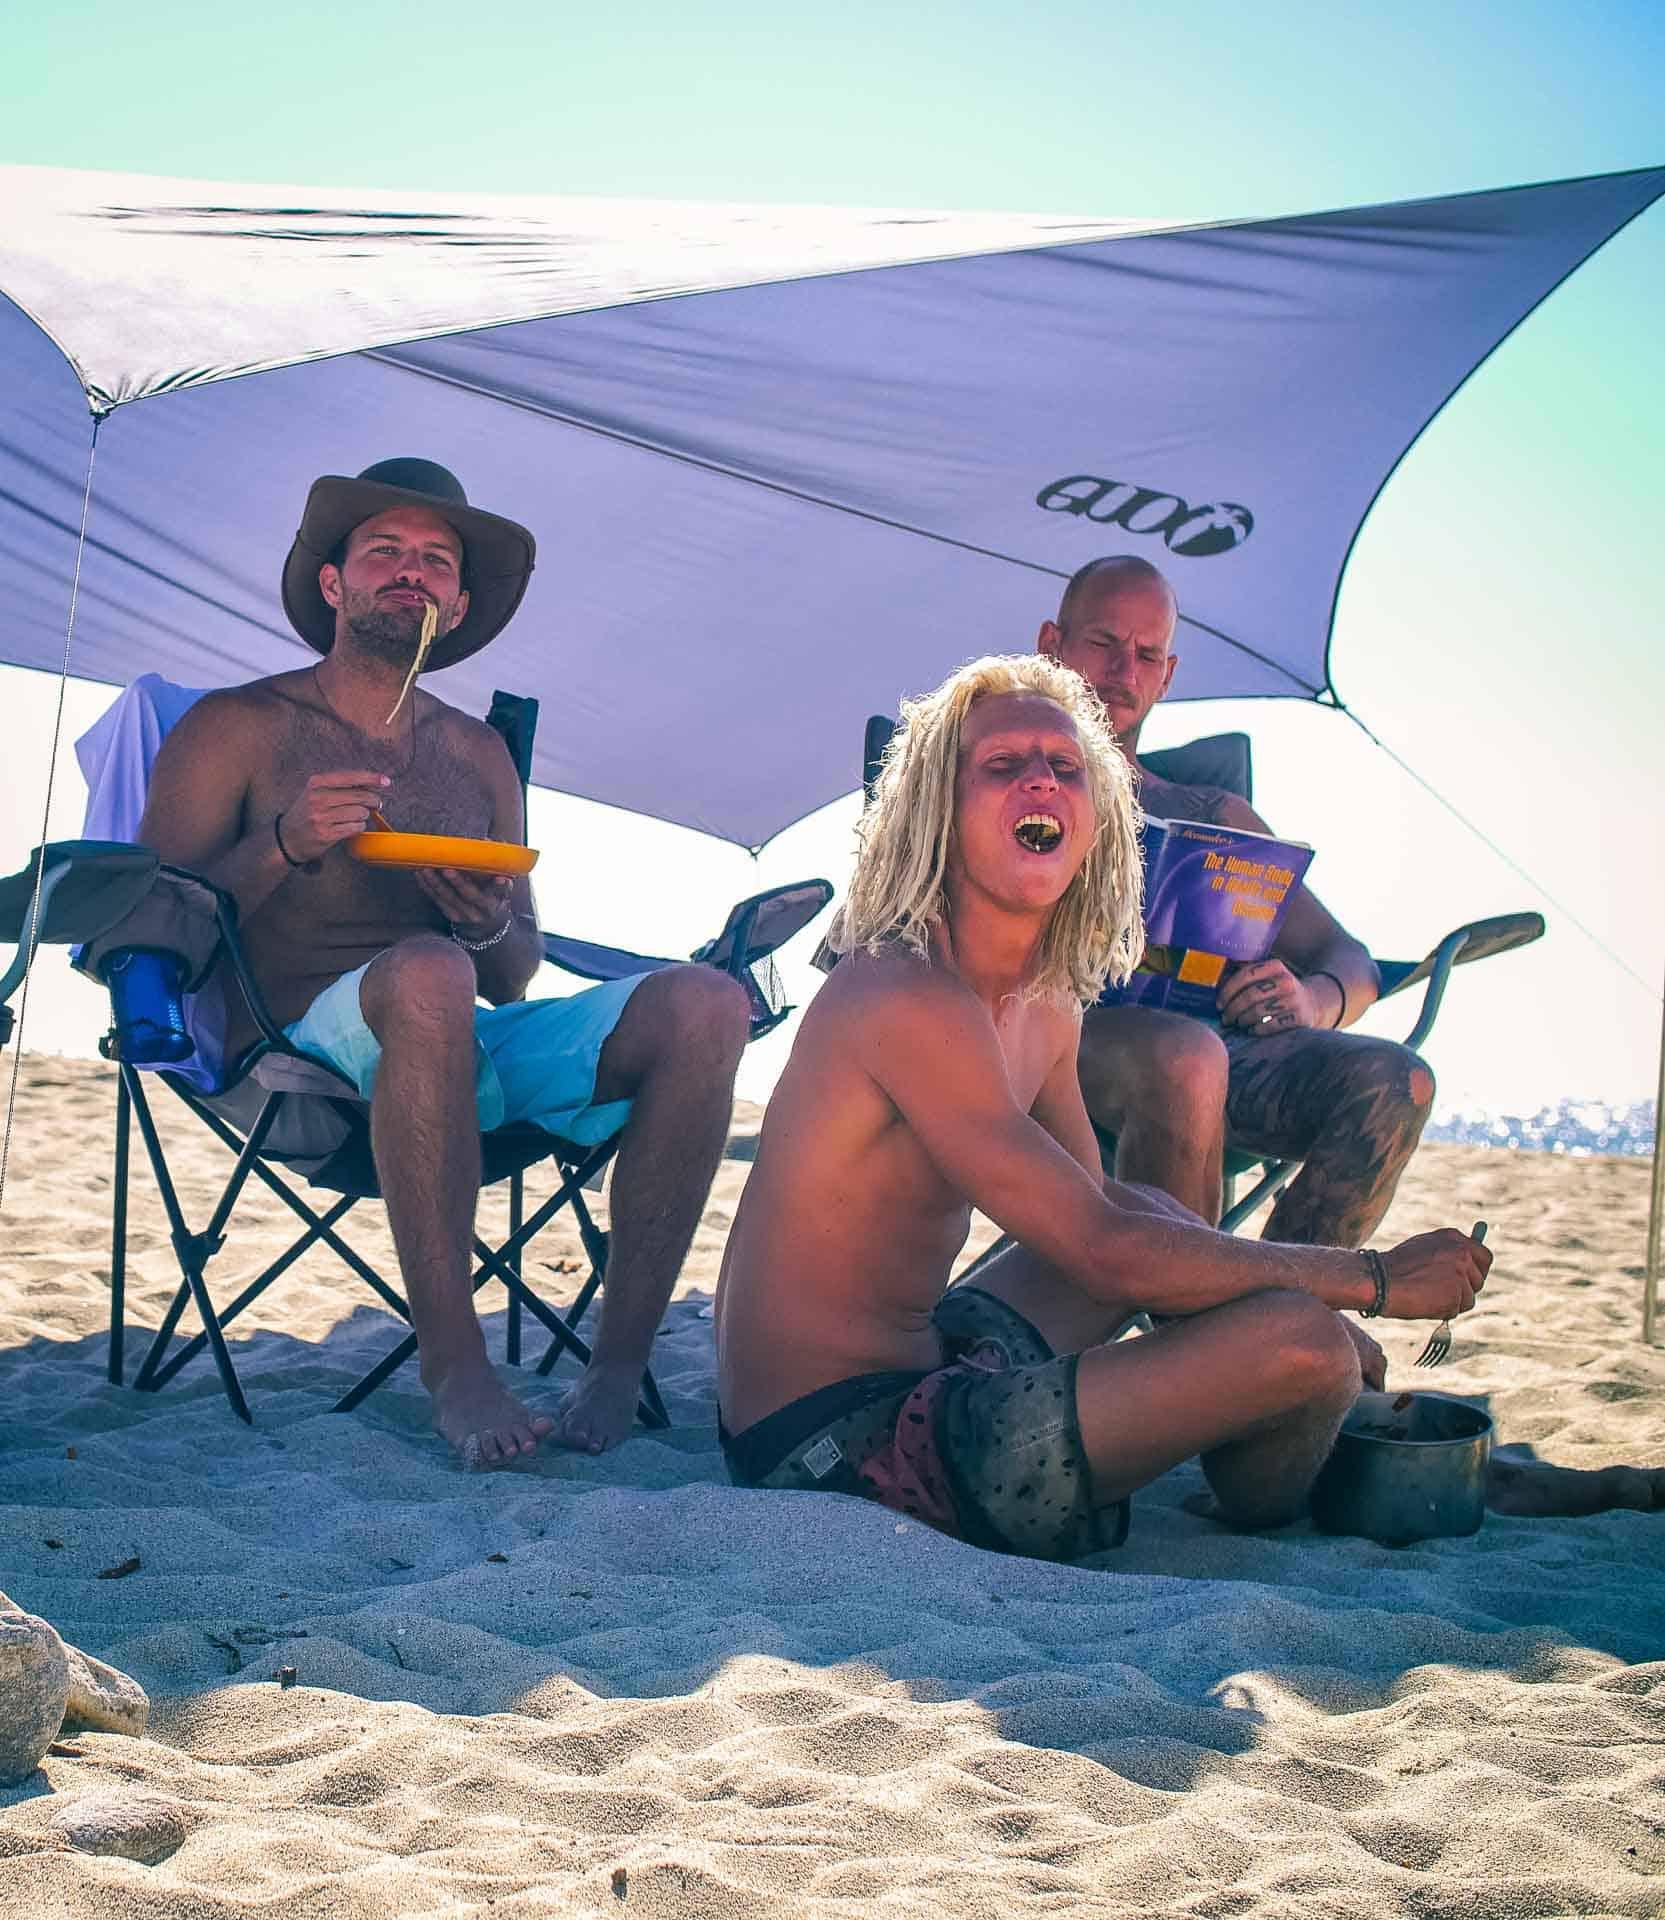 Surfer Dudes of San Pedrito Baja California